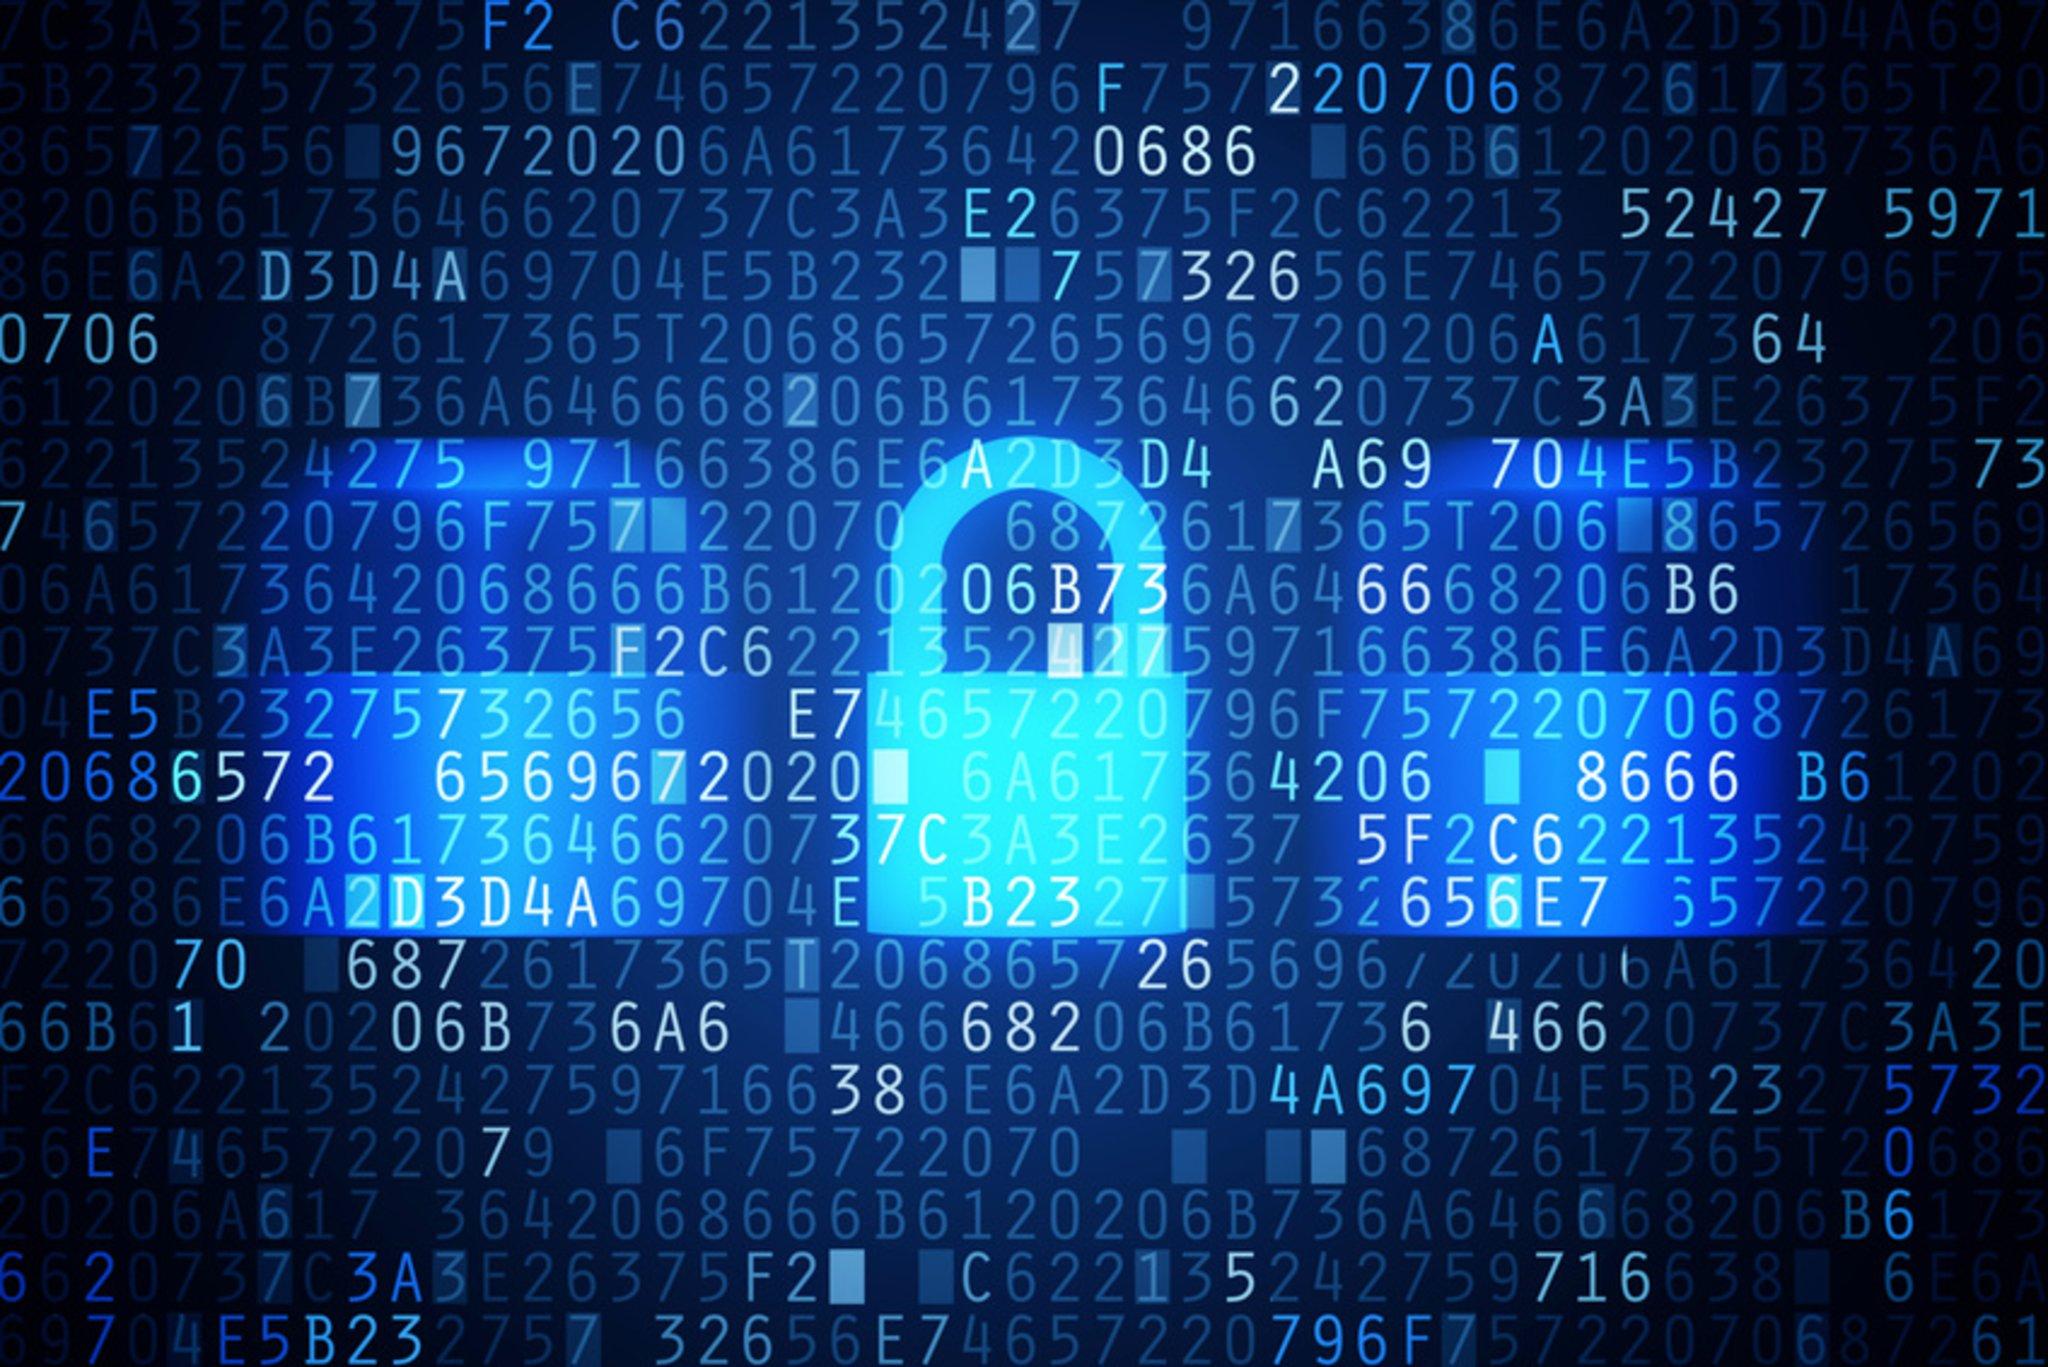 Millionen Passwörter Gehackt